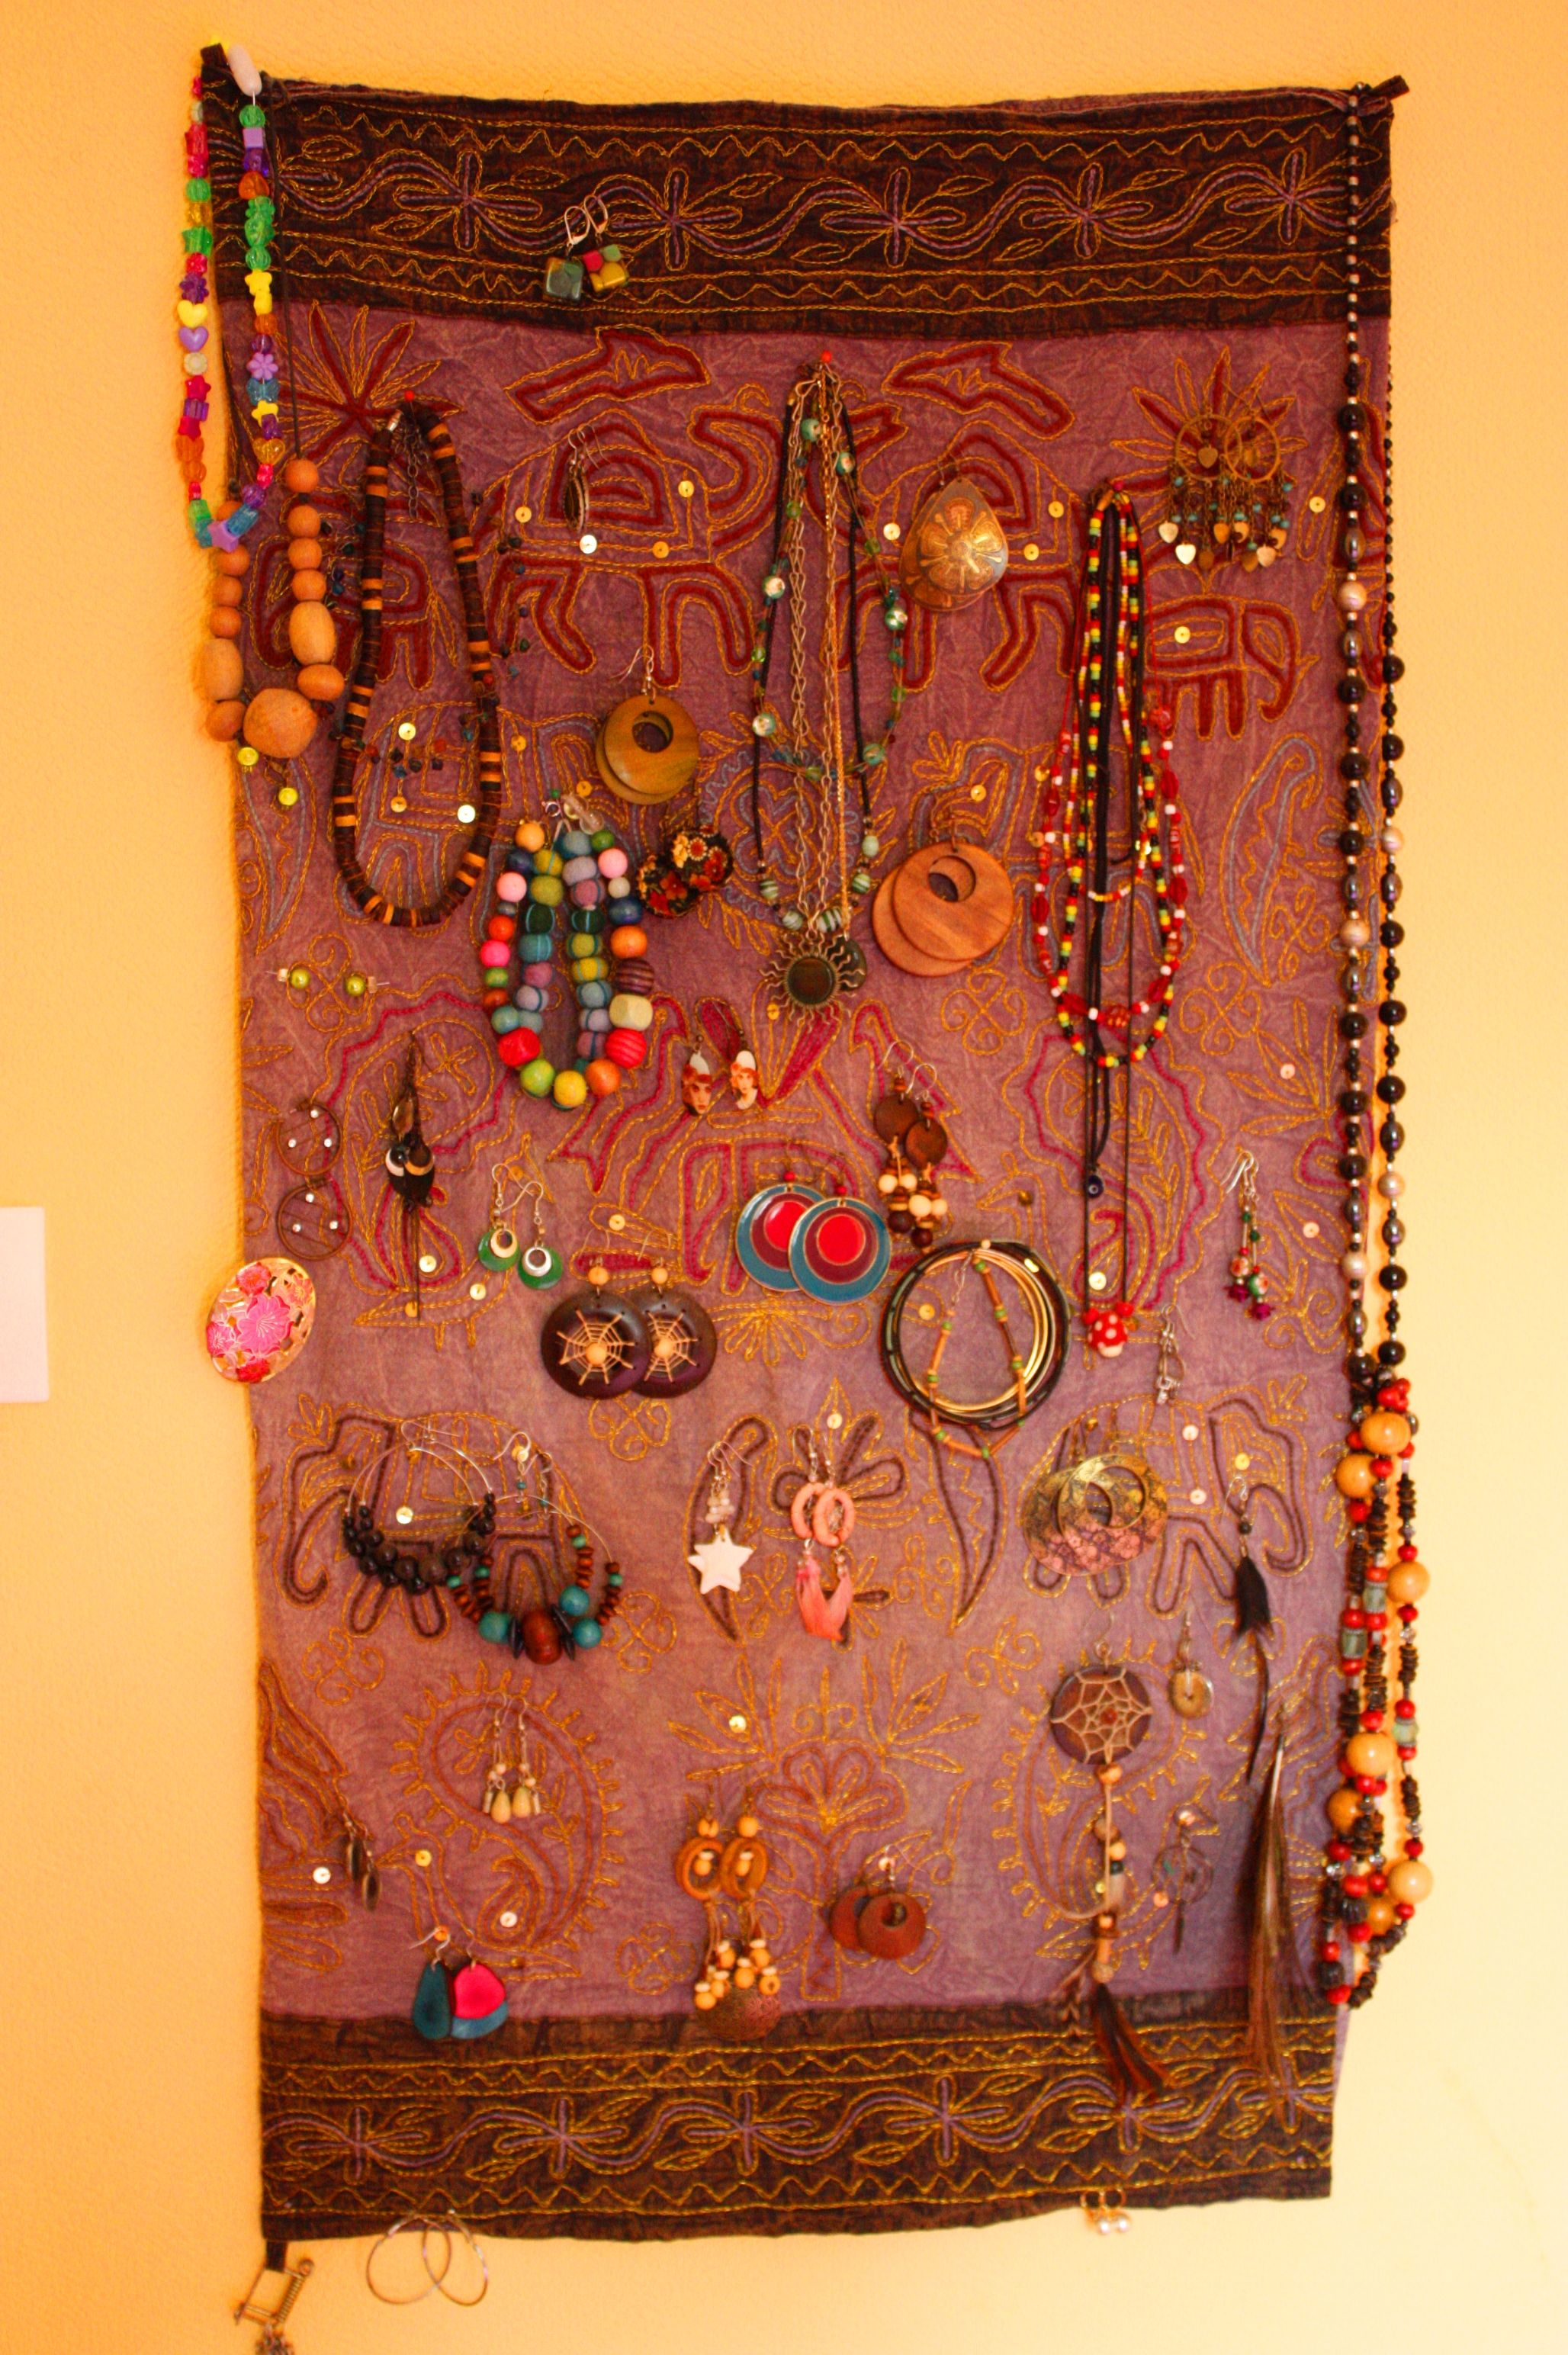 Porte-bijoux mural : simple, mais effet garanti !